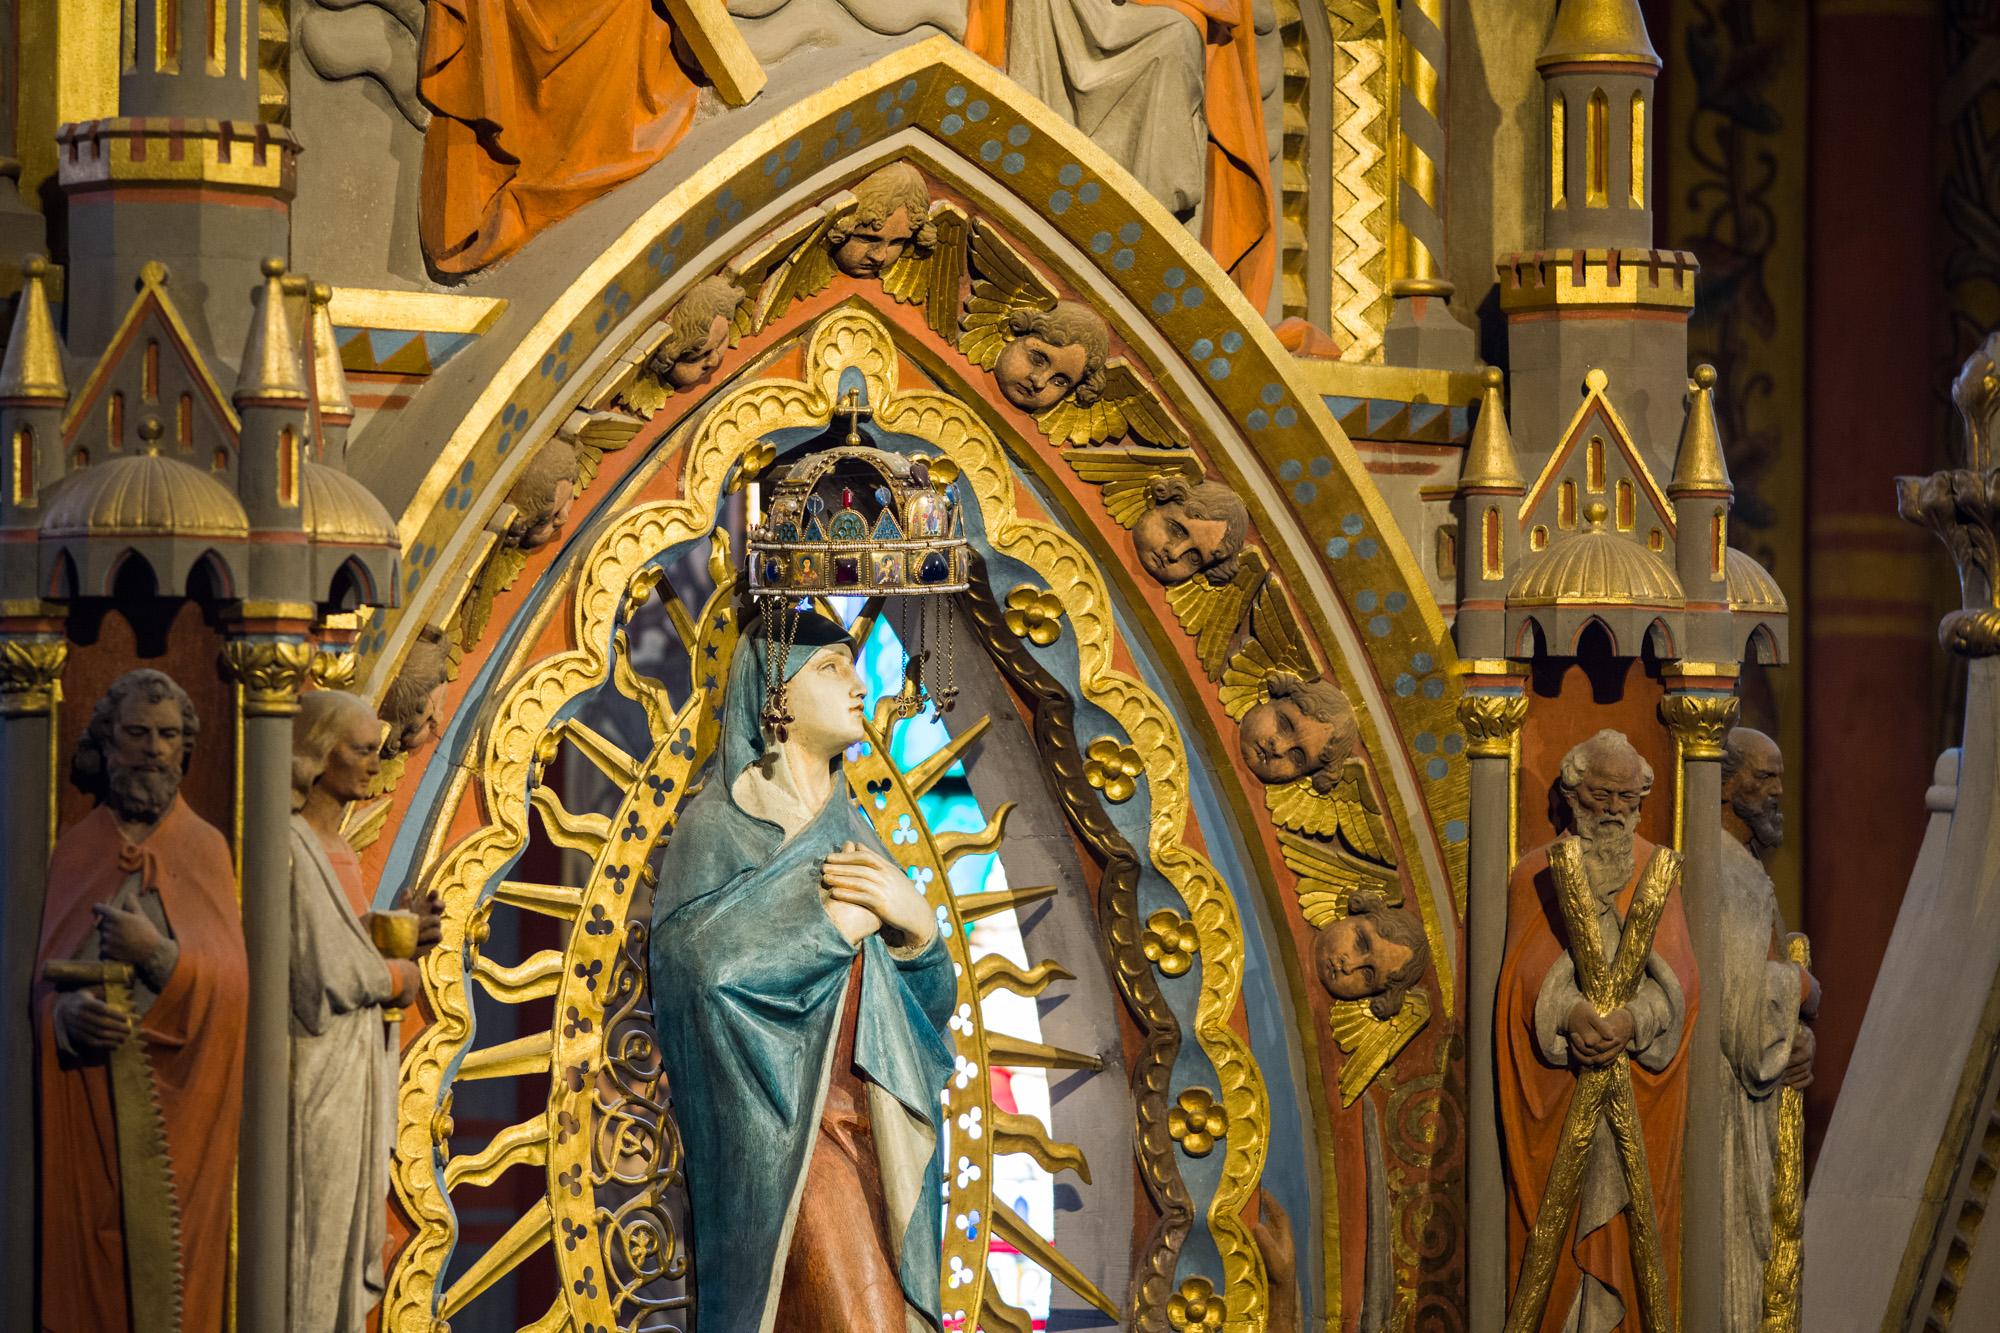 Crown of St. Stephen in Matthias Church